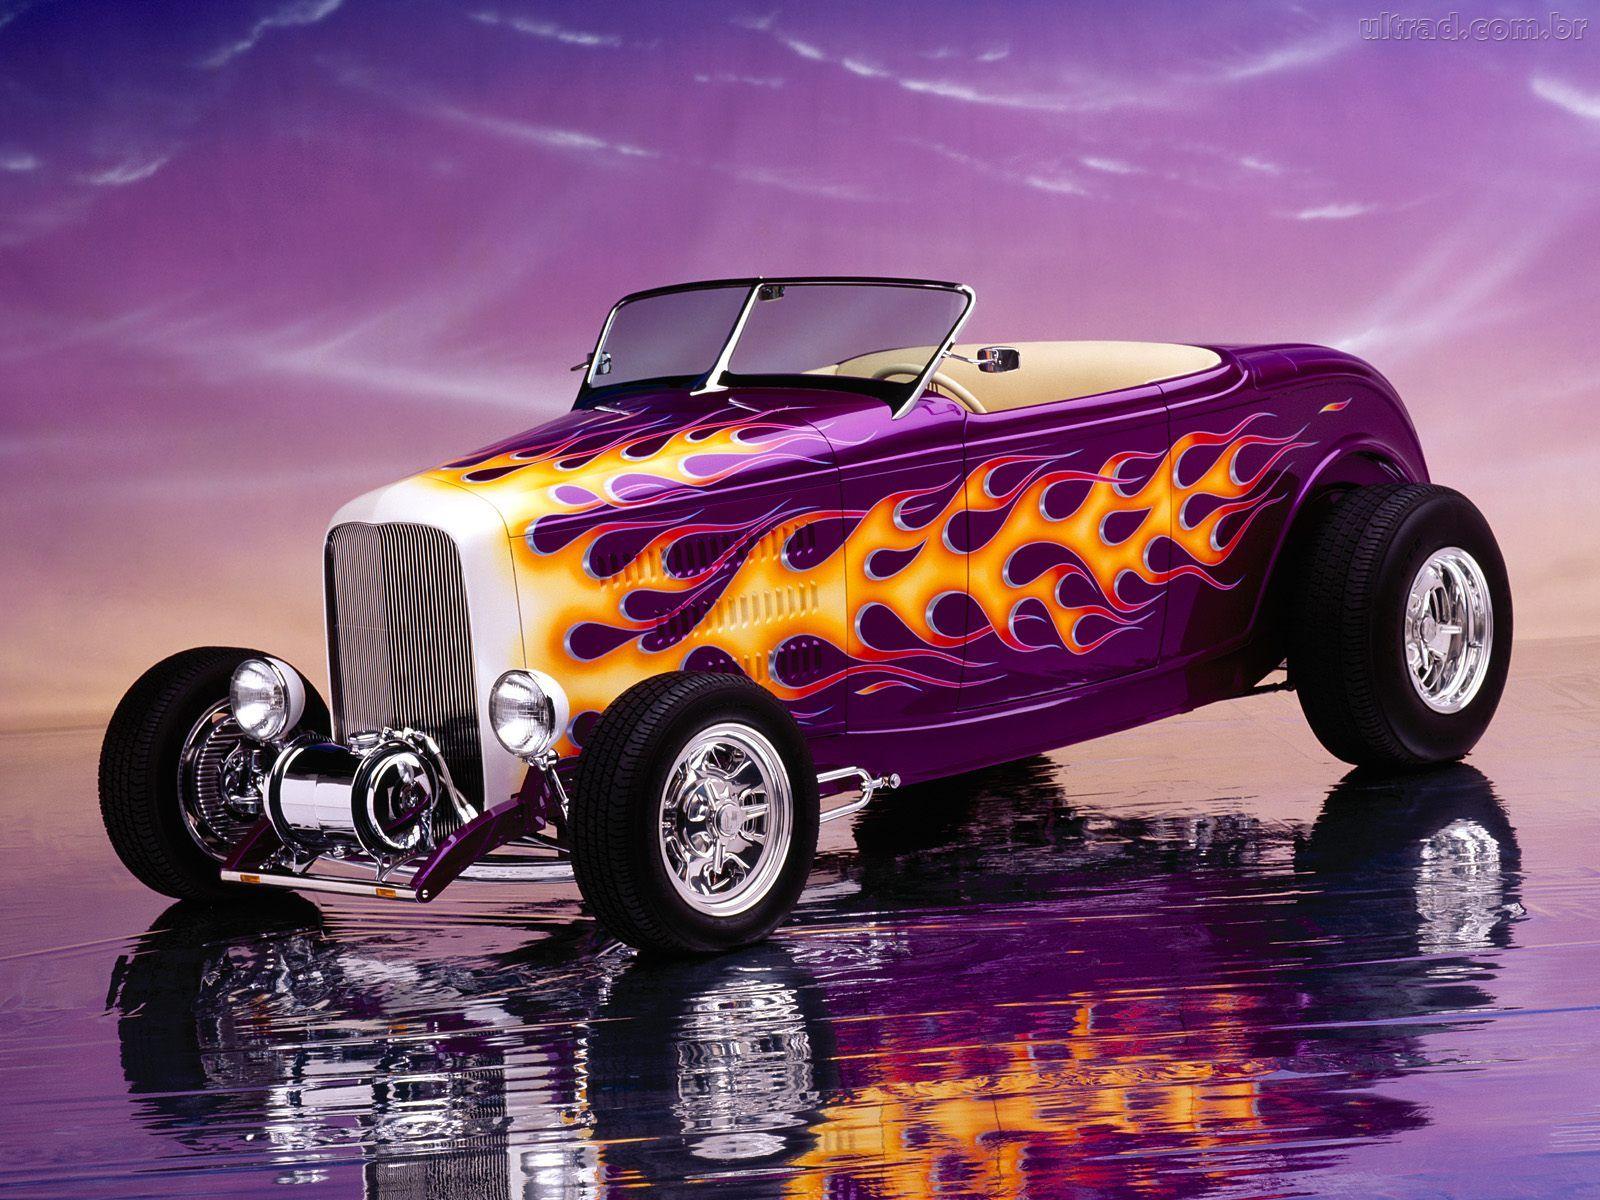 mais buscados wallpaper hot rod papel de parede carros hot rod hot rod 1600x1200